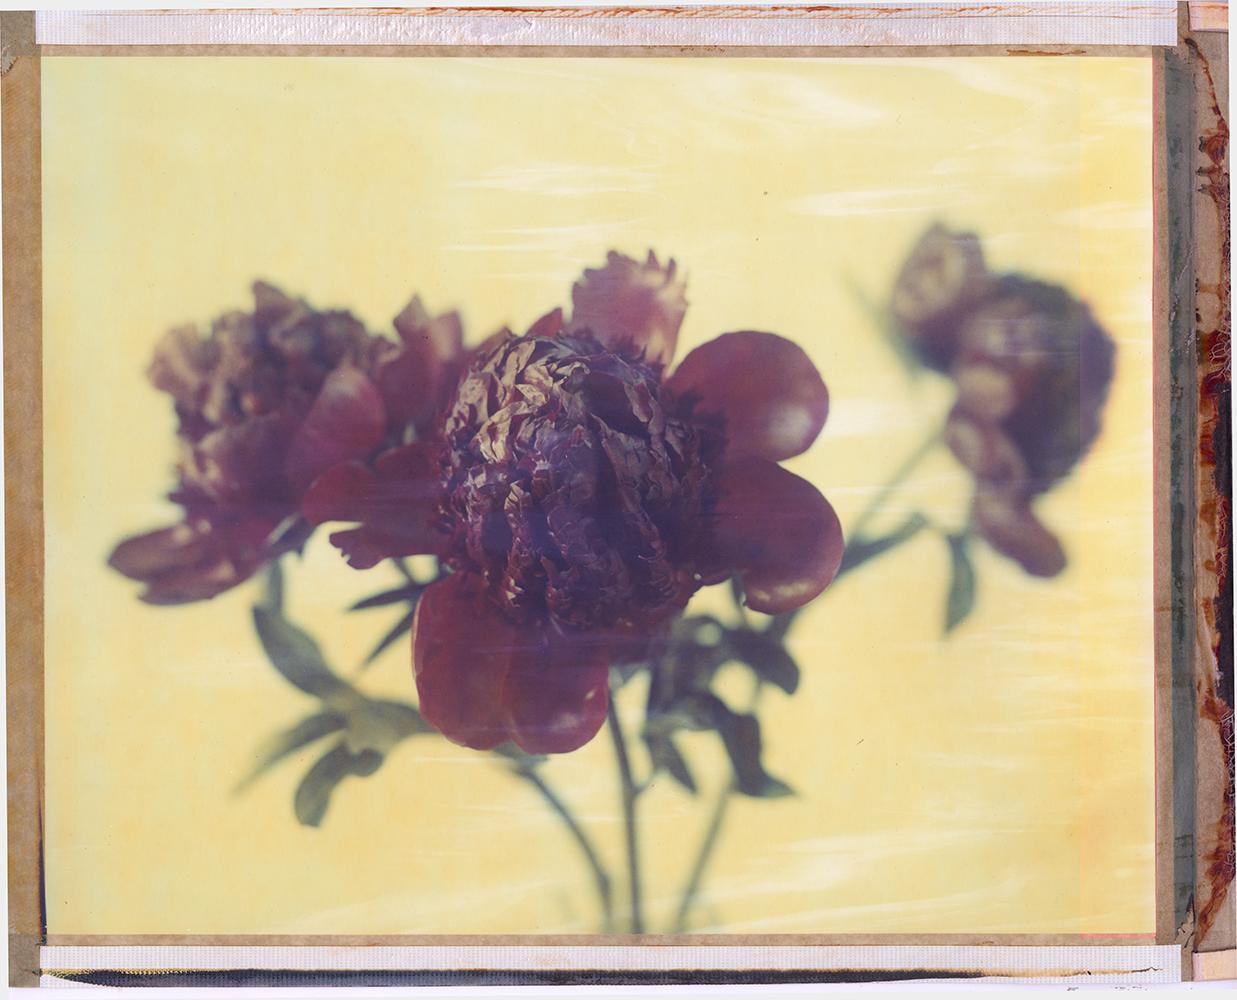 Flower study - 8x10 Polaroid